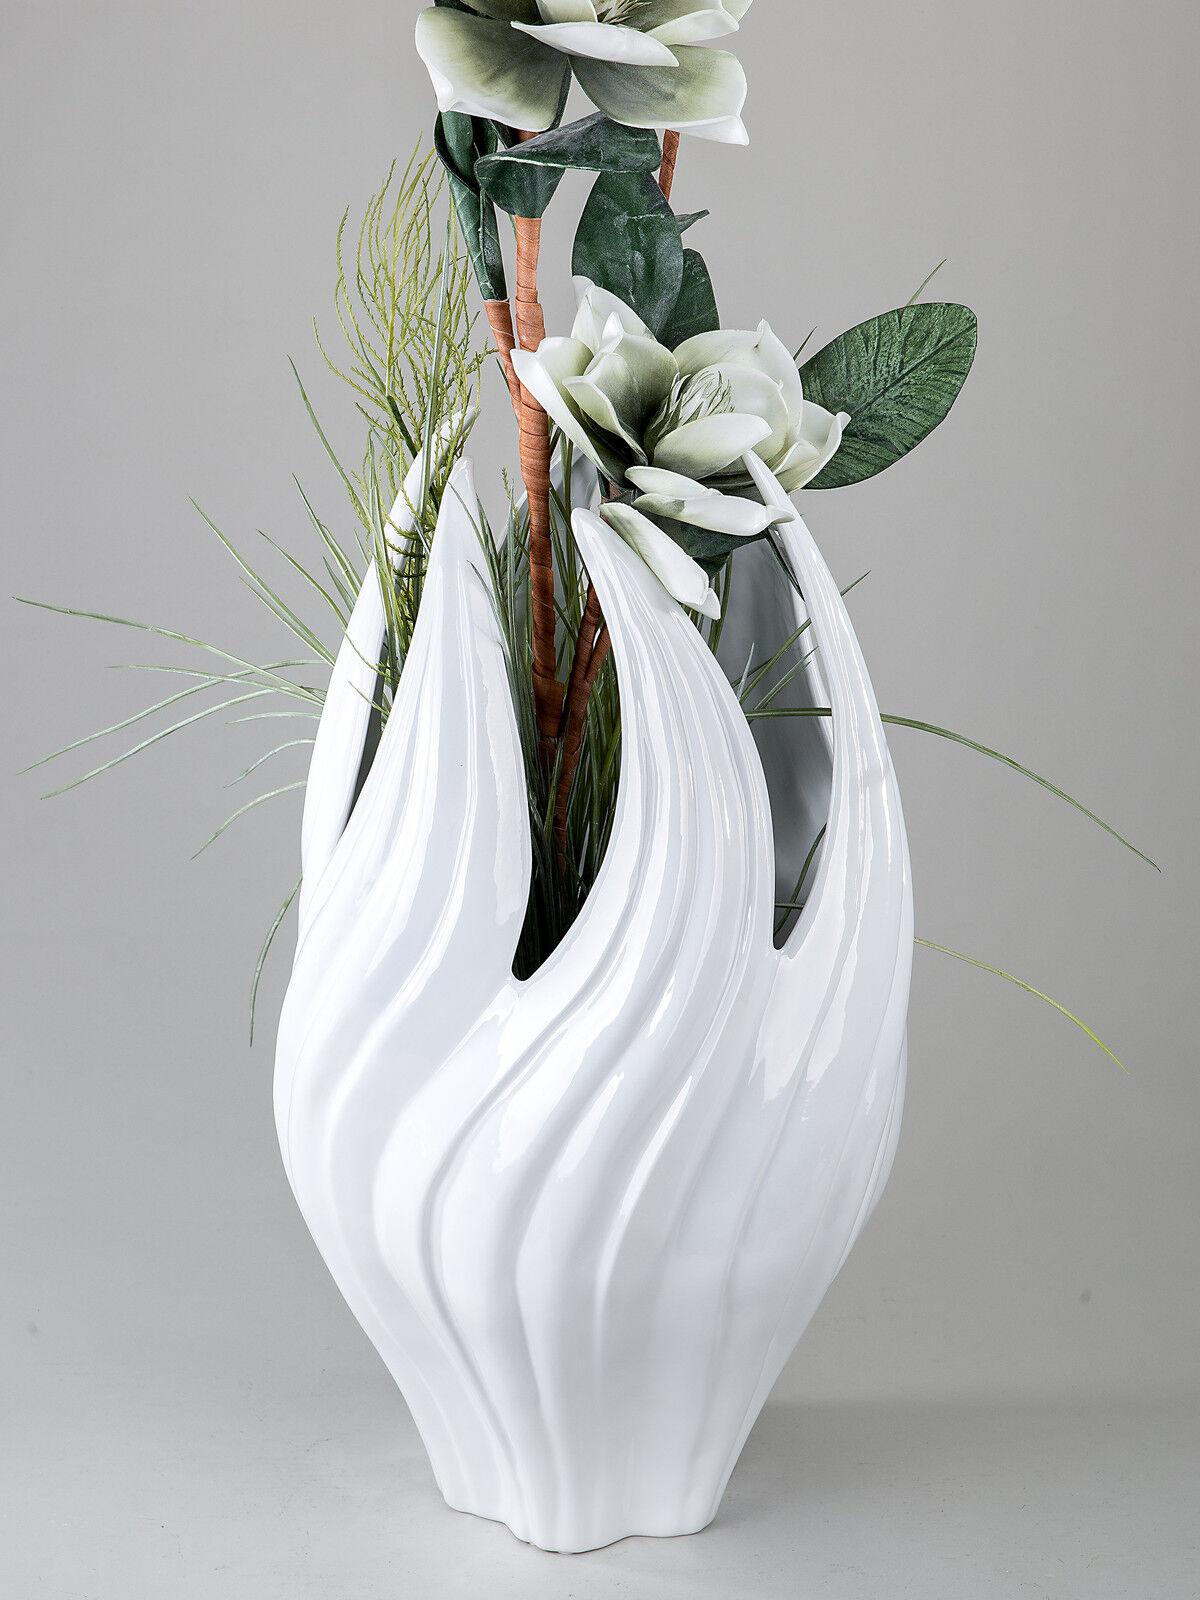 Moderne Bodenvase FLAME FLAME FLAME aus Keramik weiß glasiert 29x40 cm 1a1739